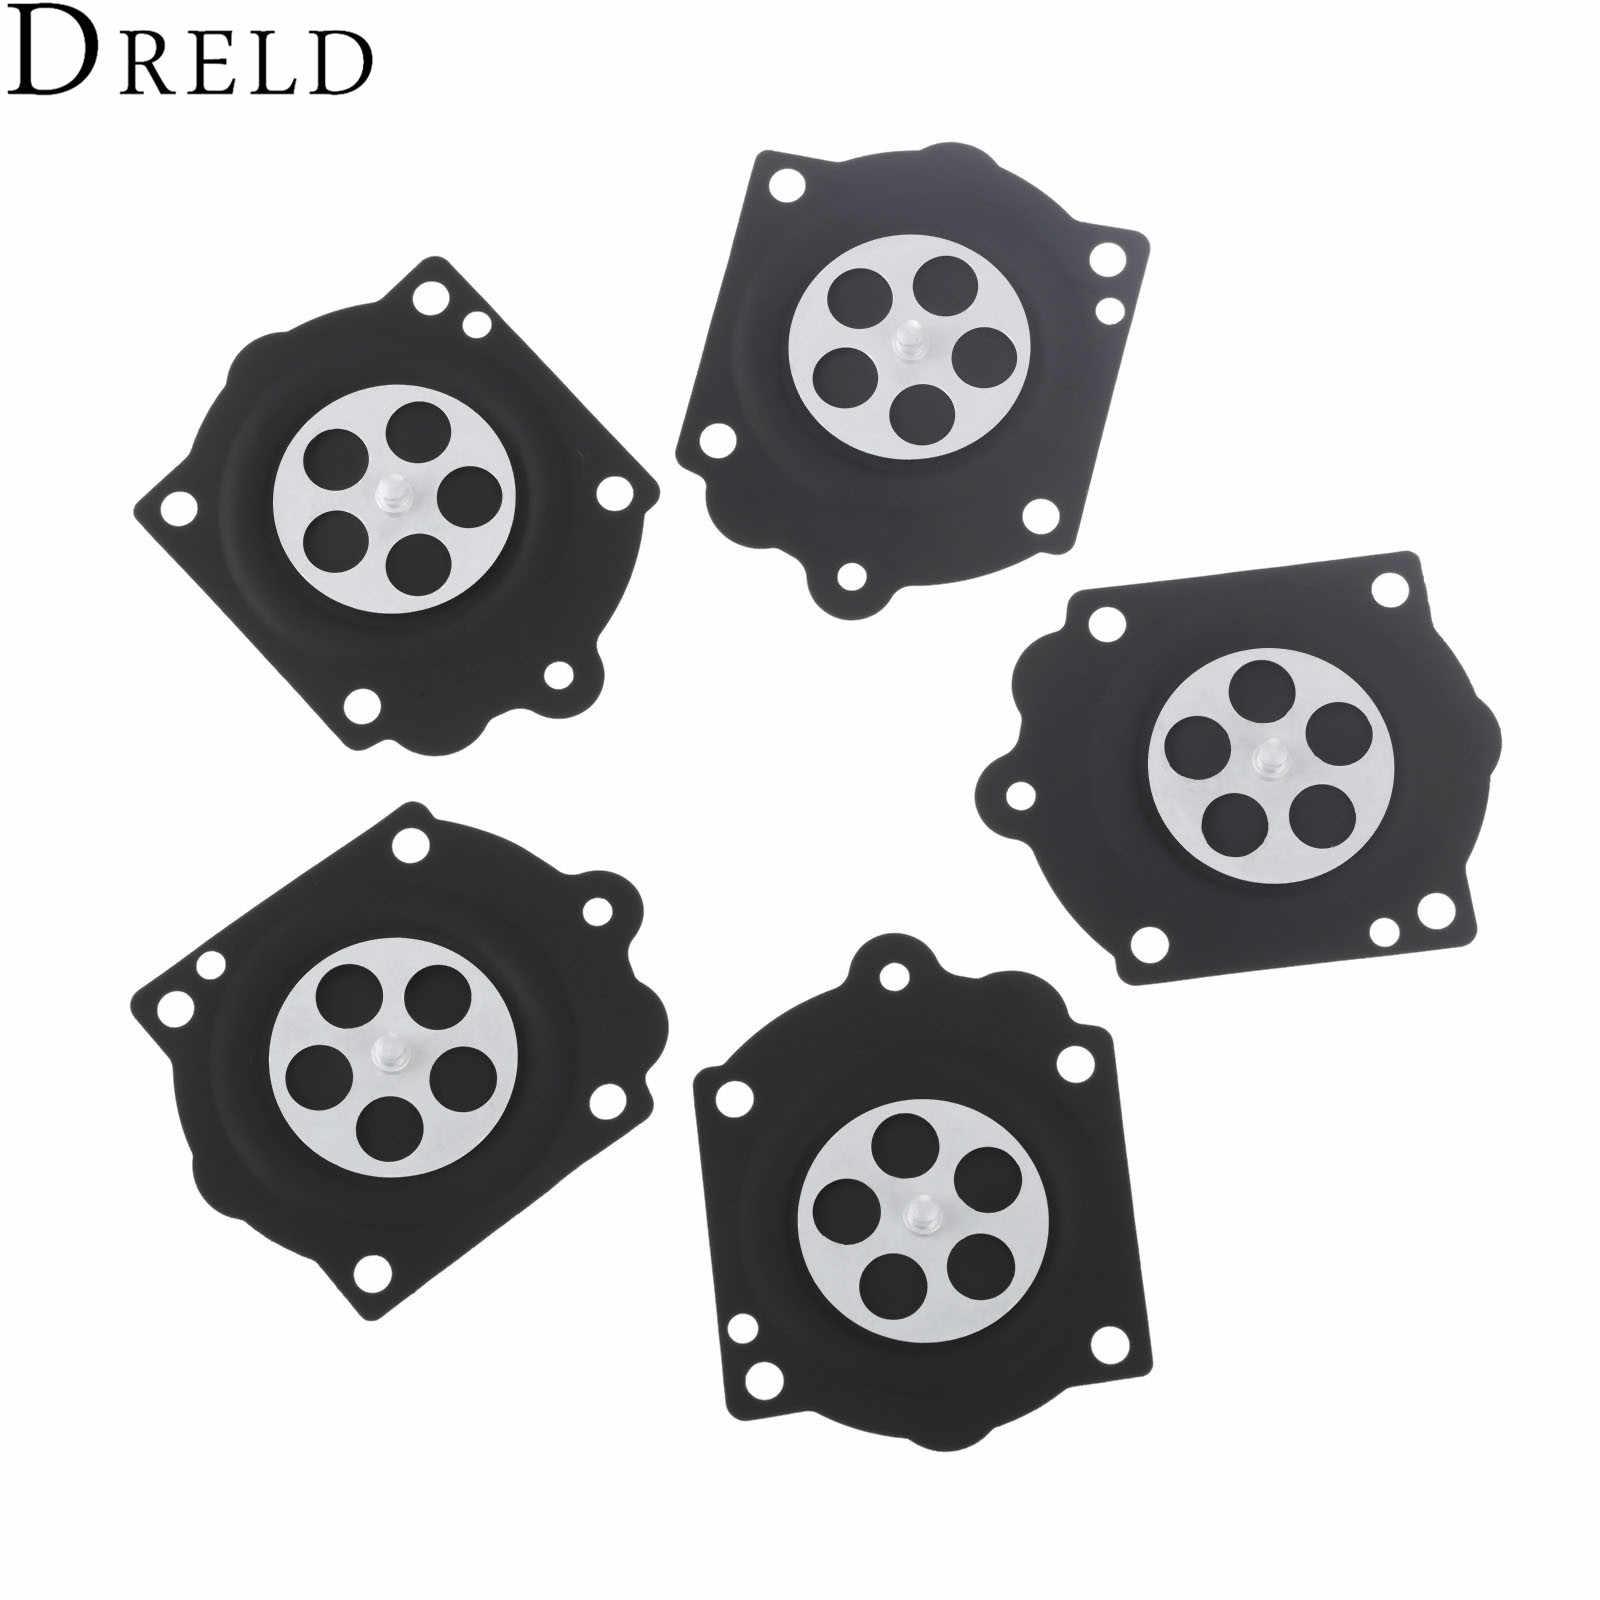 small resolution of dreld 5pcs carburetor carb rebuild metering diaphragm kit for walbro hdb wg mcculloch pro mac 610